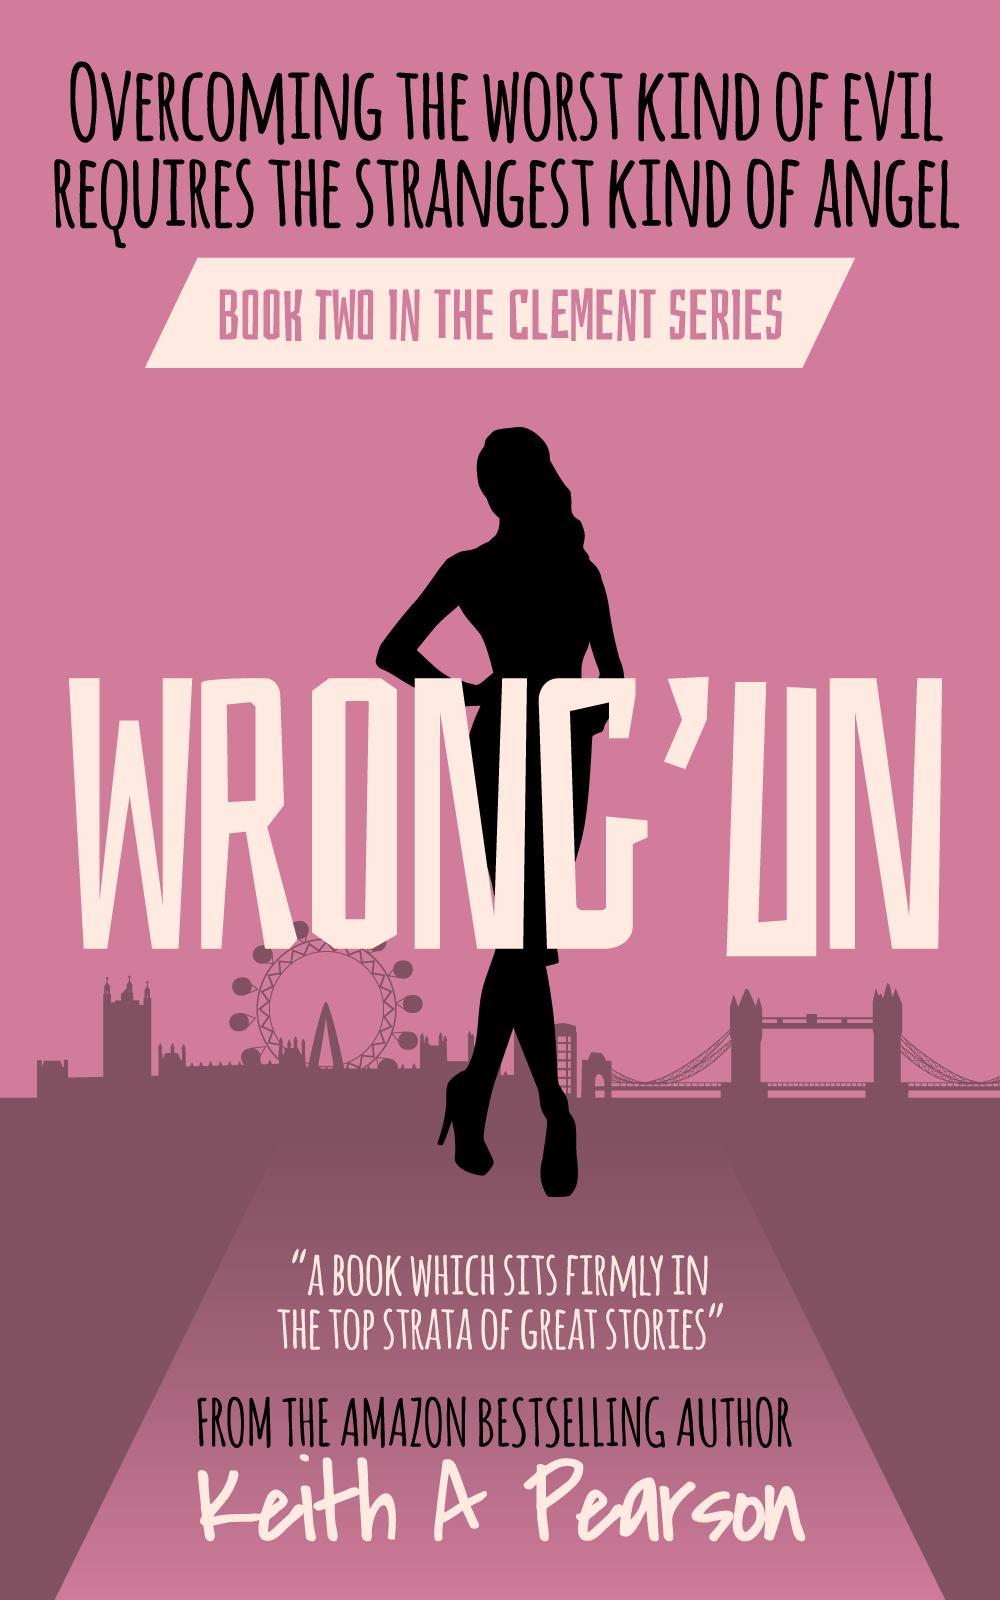 Wrong'un By Keith A Pearson